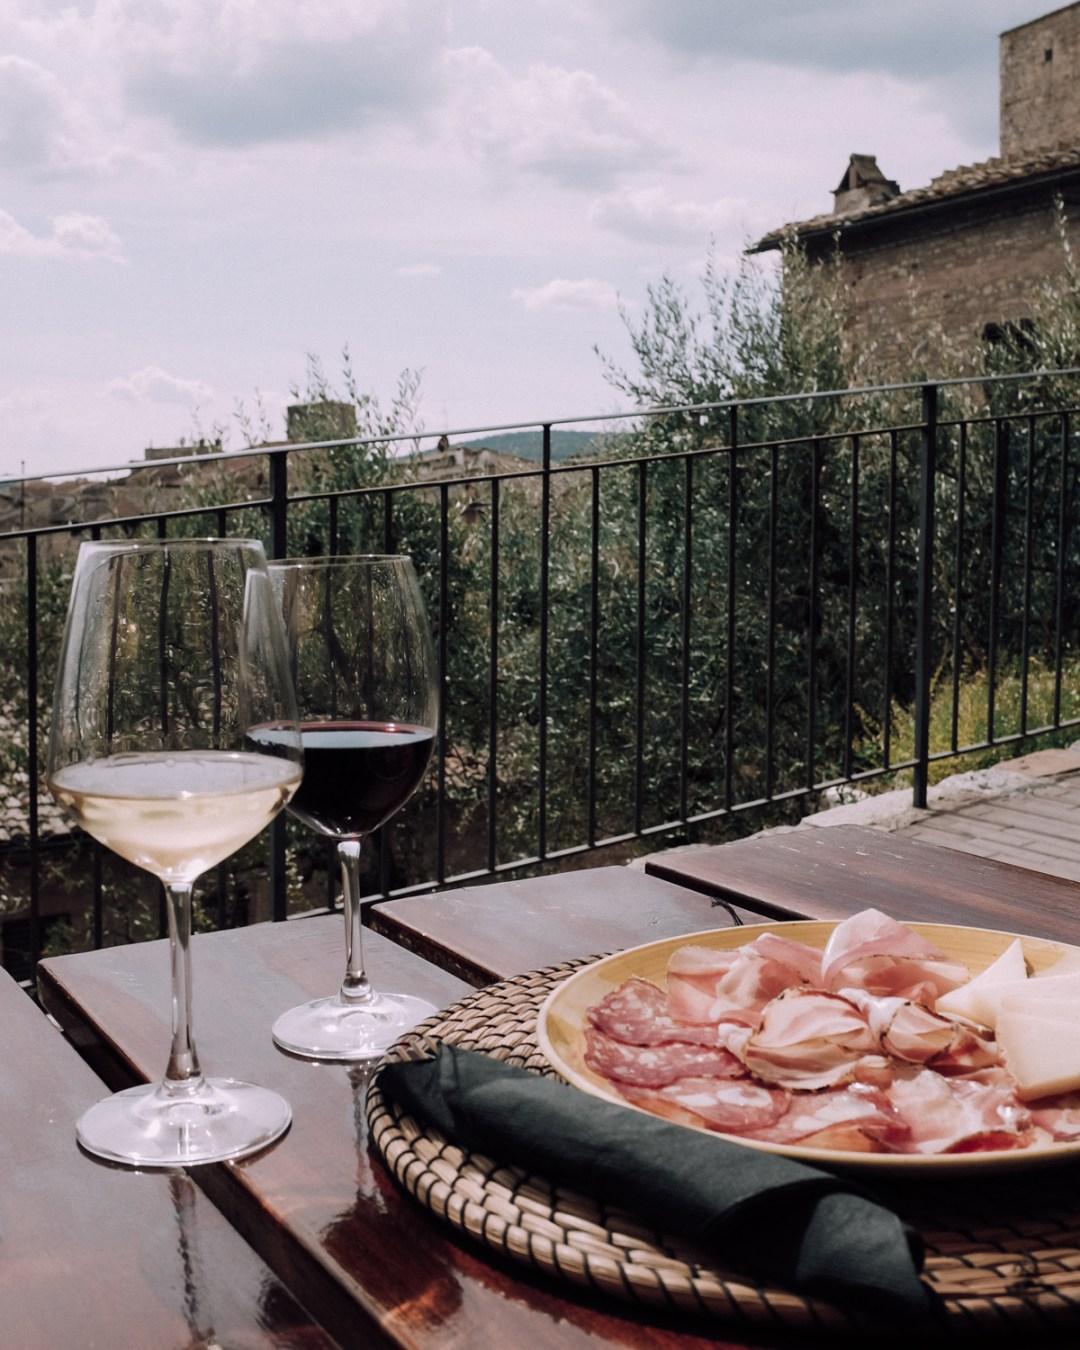 inastil, Ü50Blogger, Reiseblogger, Toskana, Villa, Florenz, Siena, Certaldo, Lifestyle, Italienreise, Italienliebe, Cabriotour-46